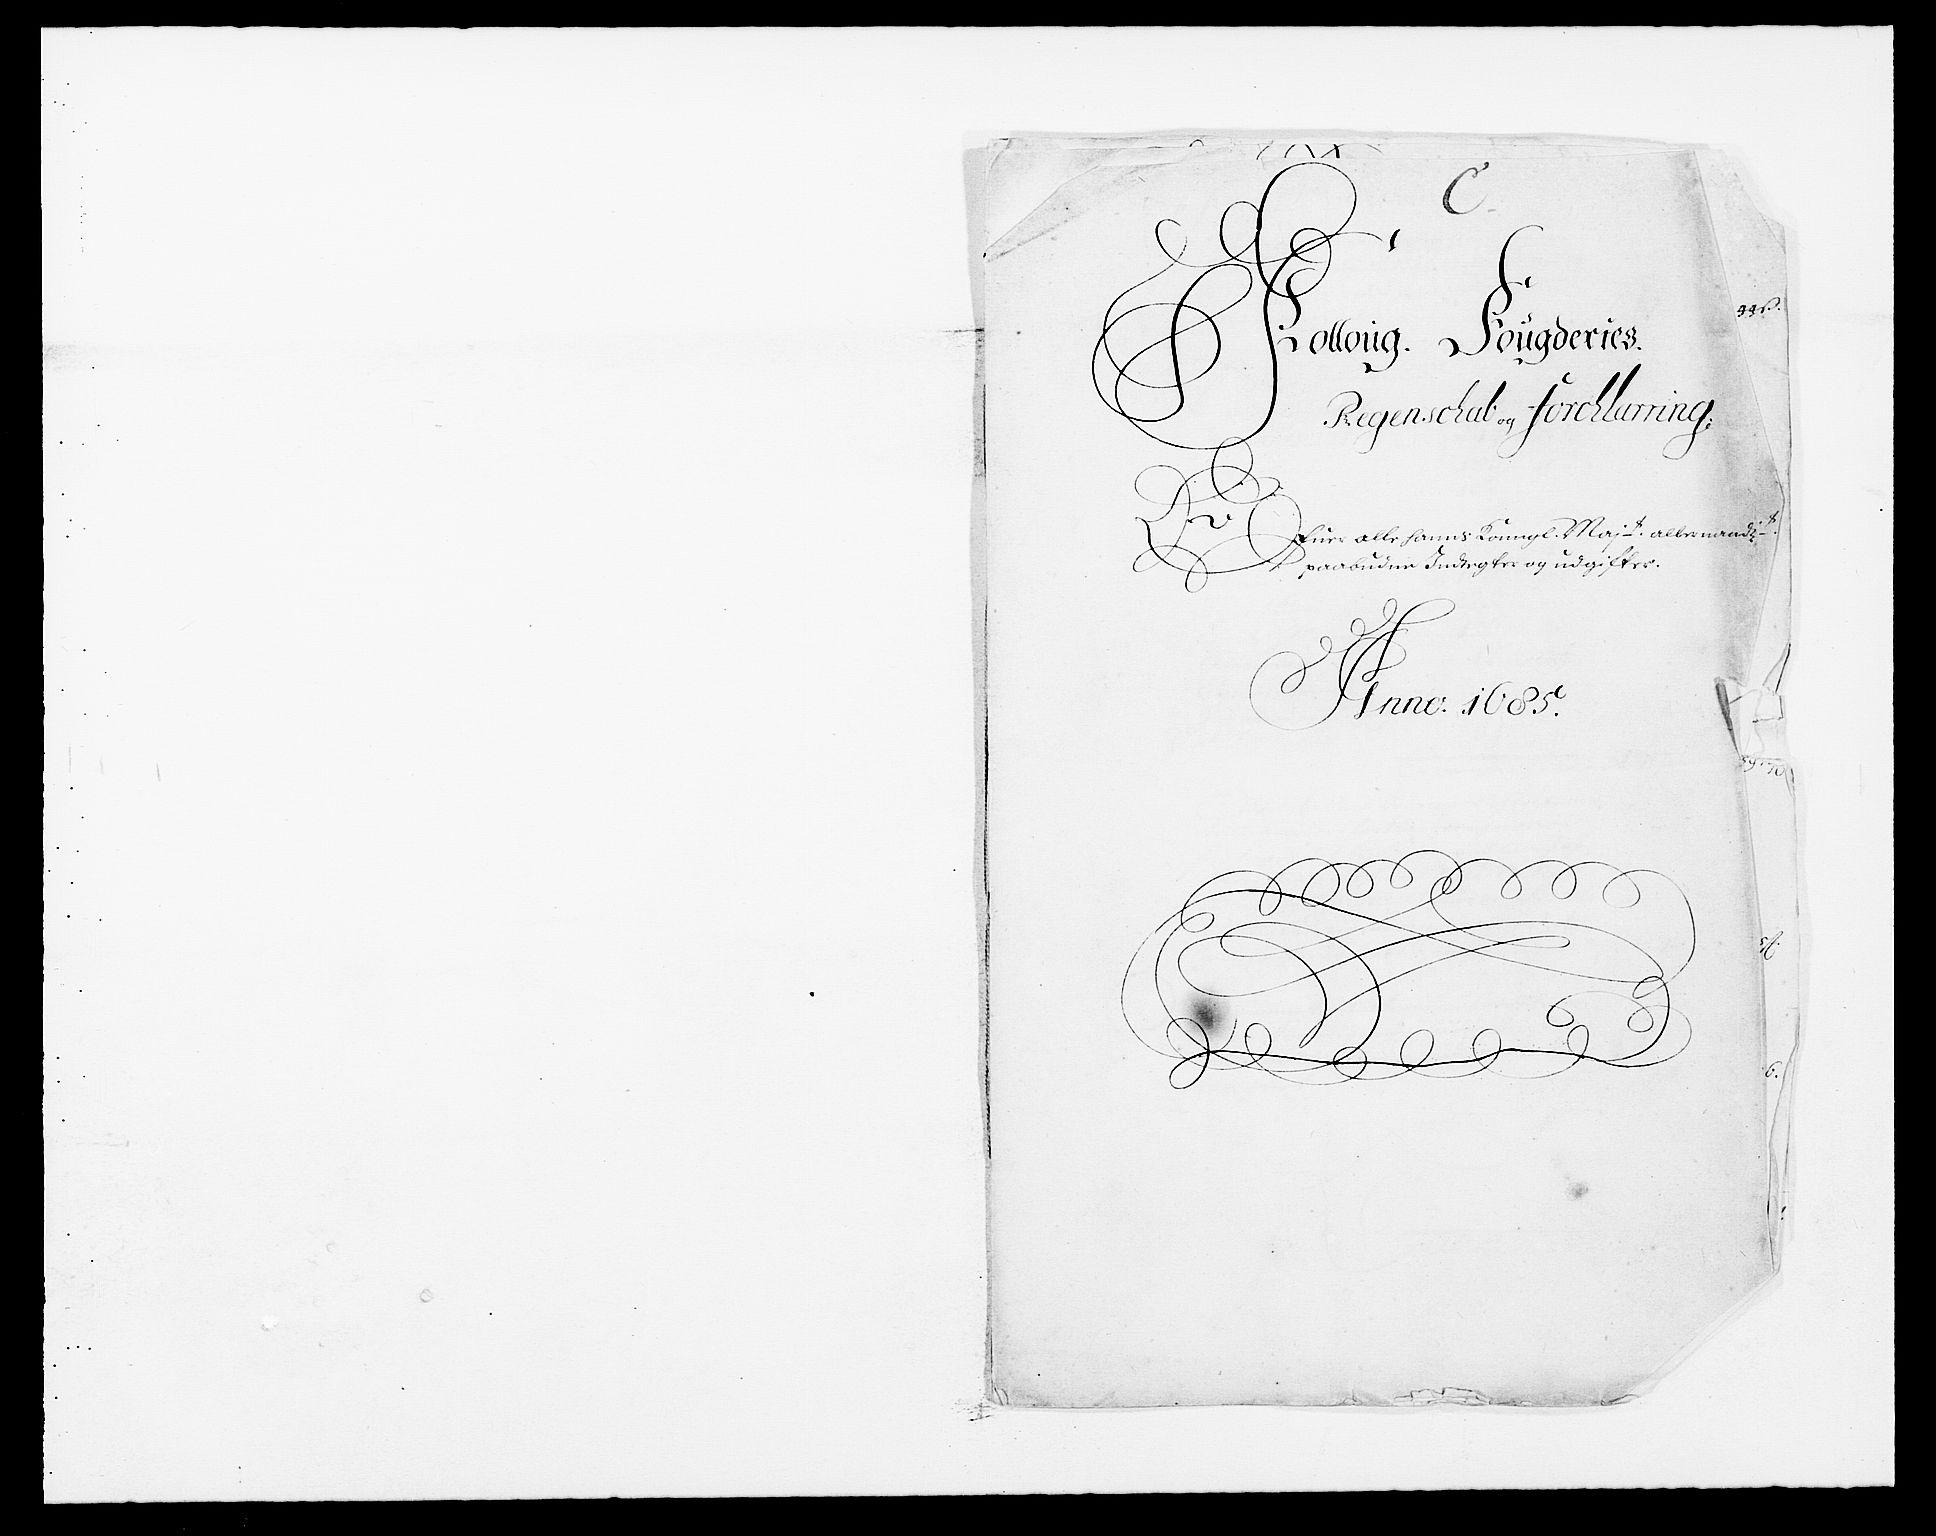 RA, Rentekammeret inntil 1814, Reviderte regnskaper, Fogderegnskap, R09/L0433: Fogderegnskap Follo, 1685-1686, s. 2